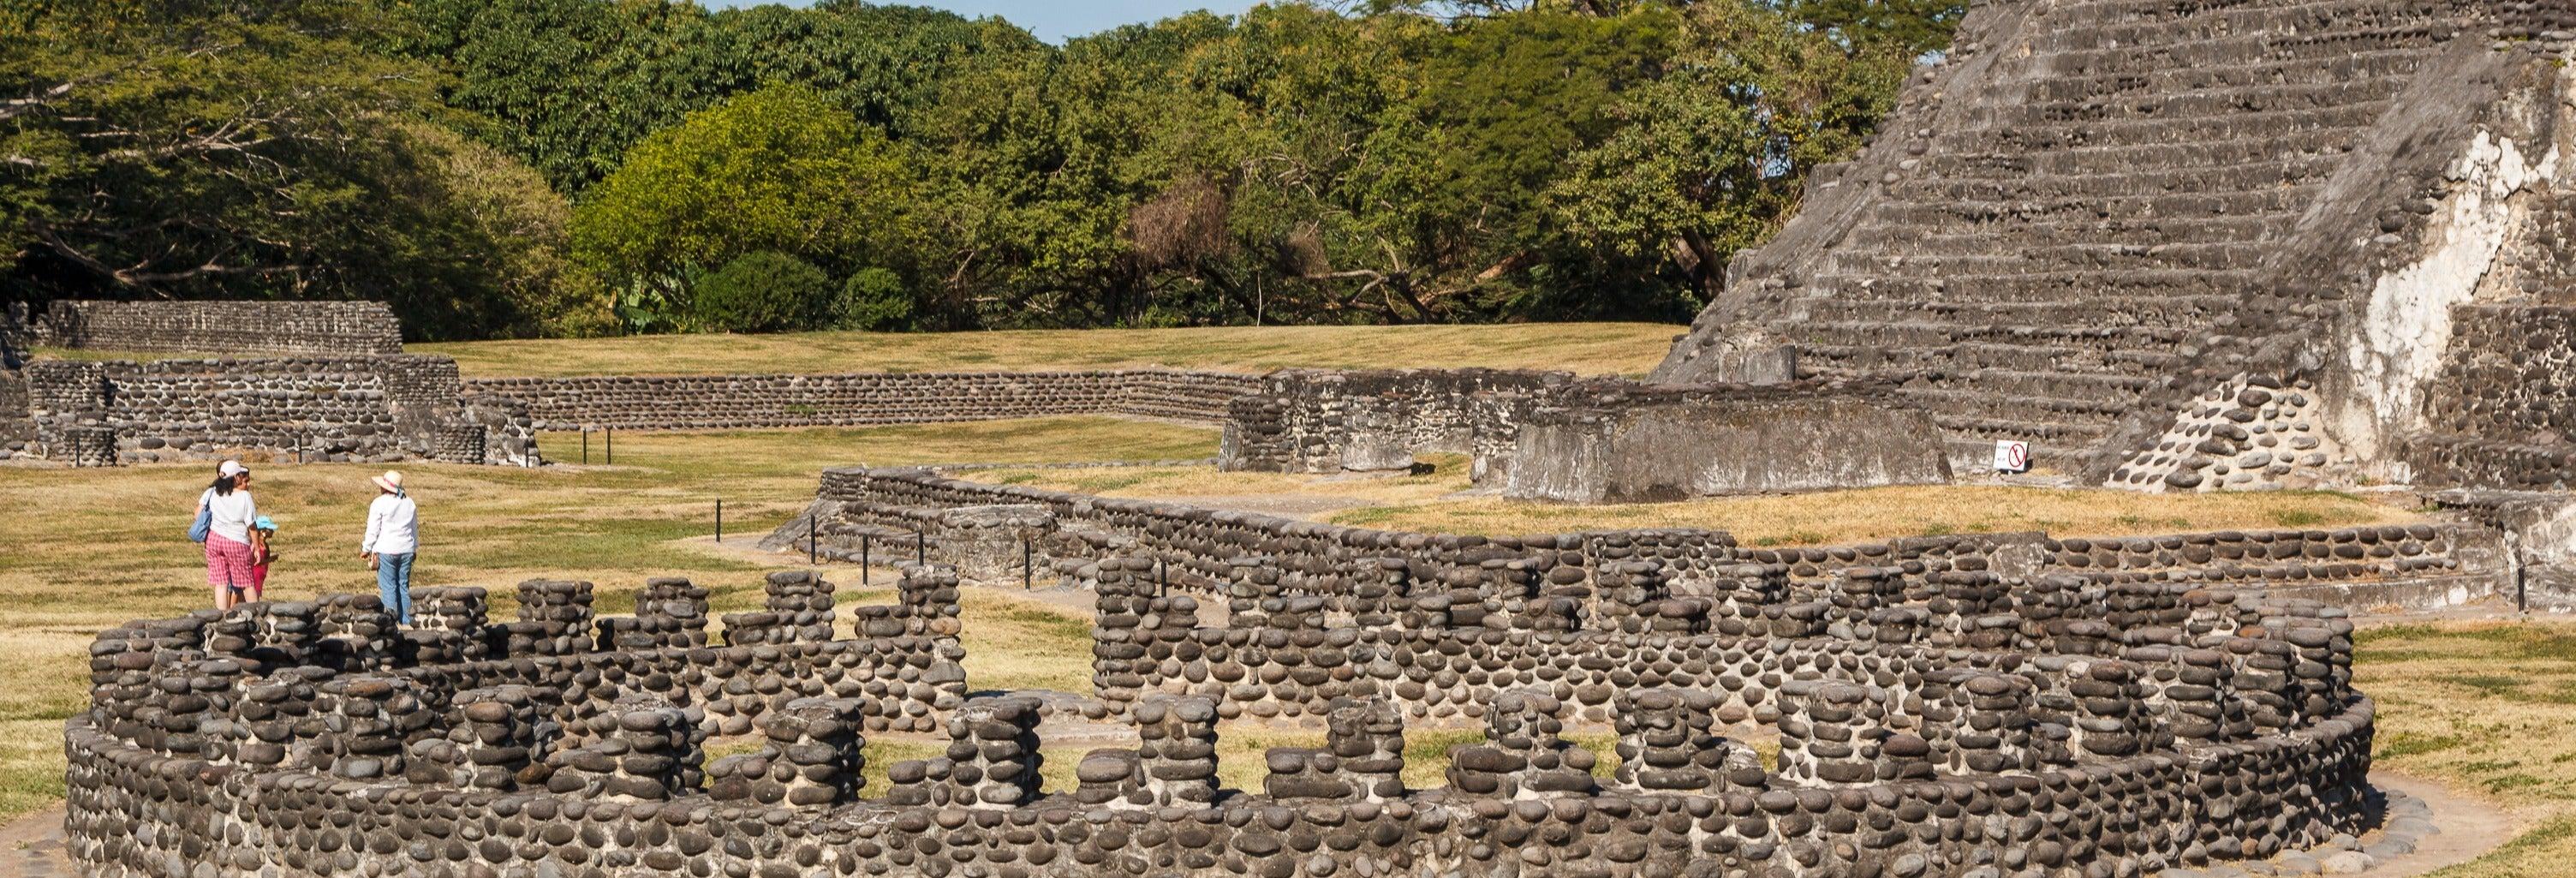 La Antigua & Cempoala Tour